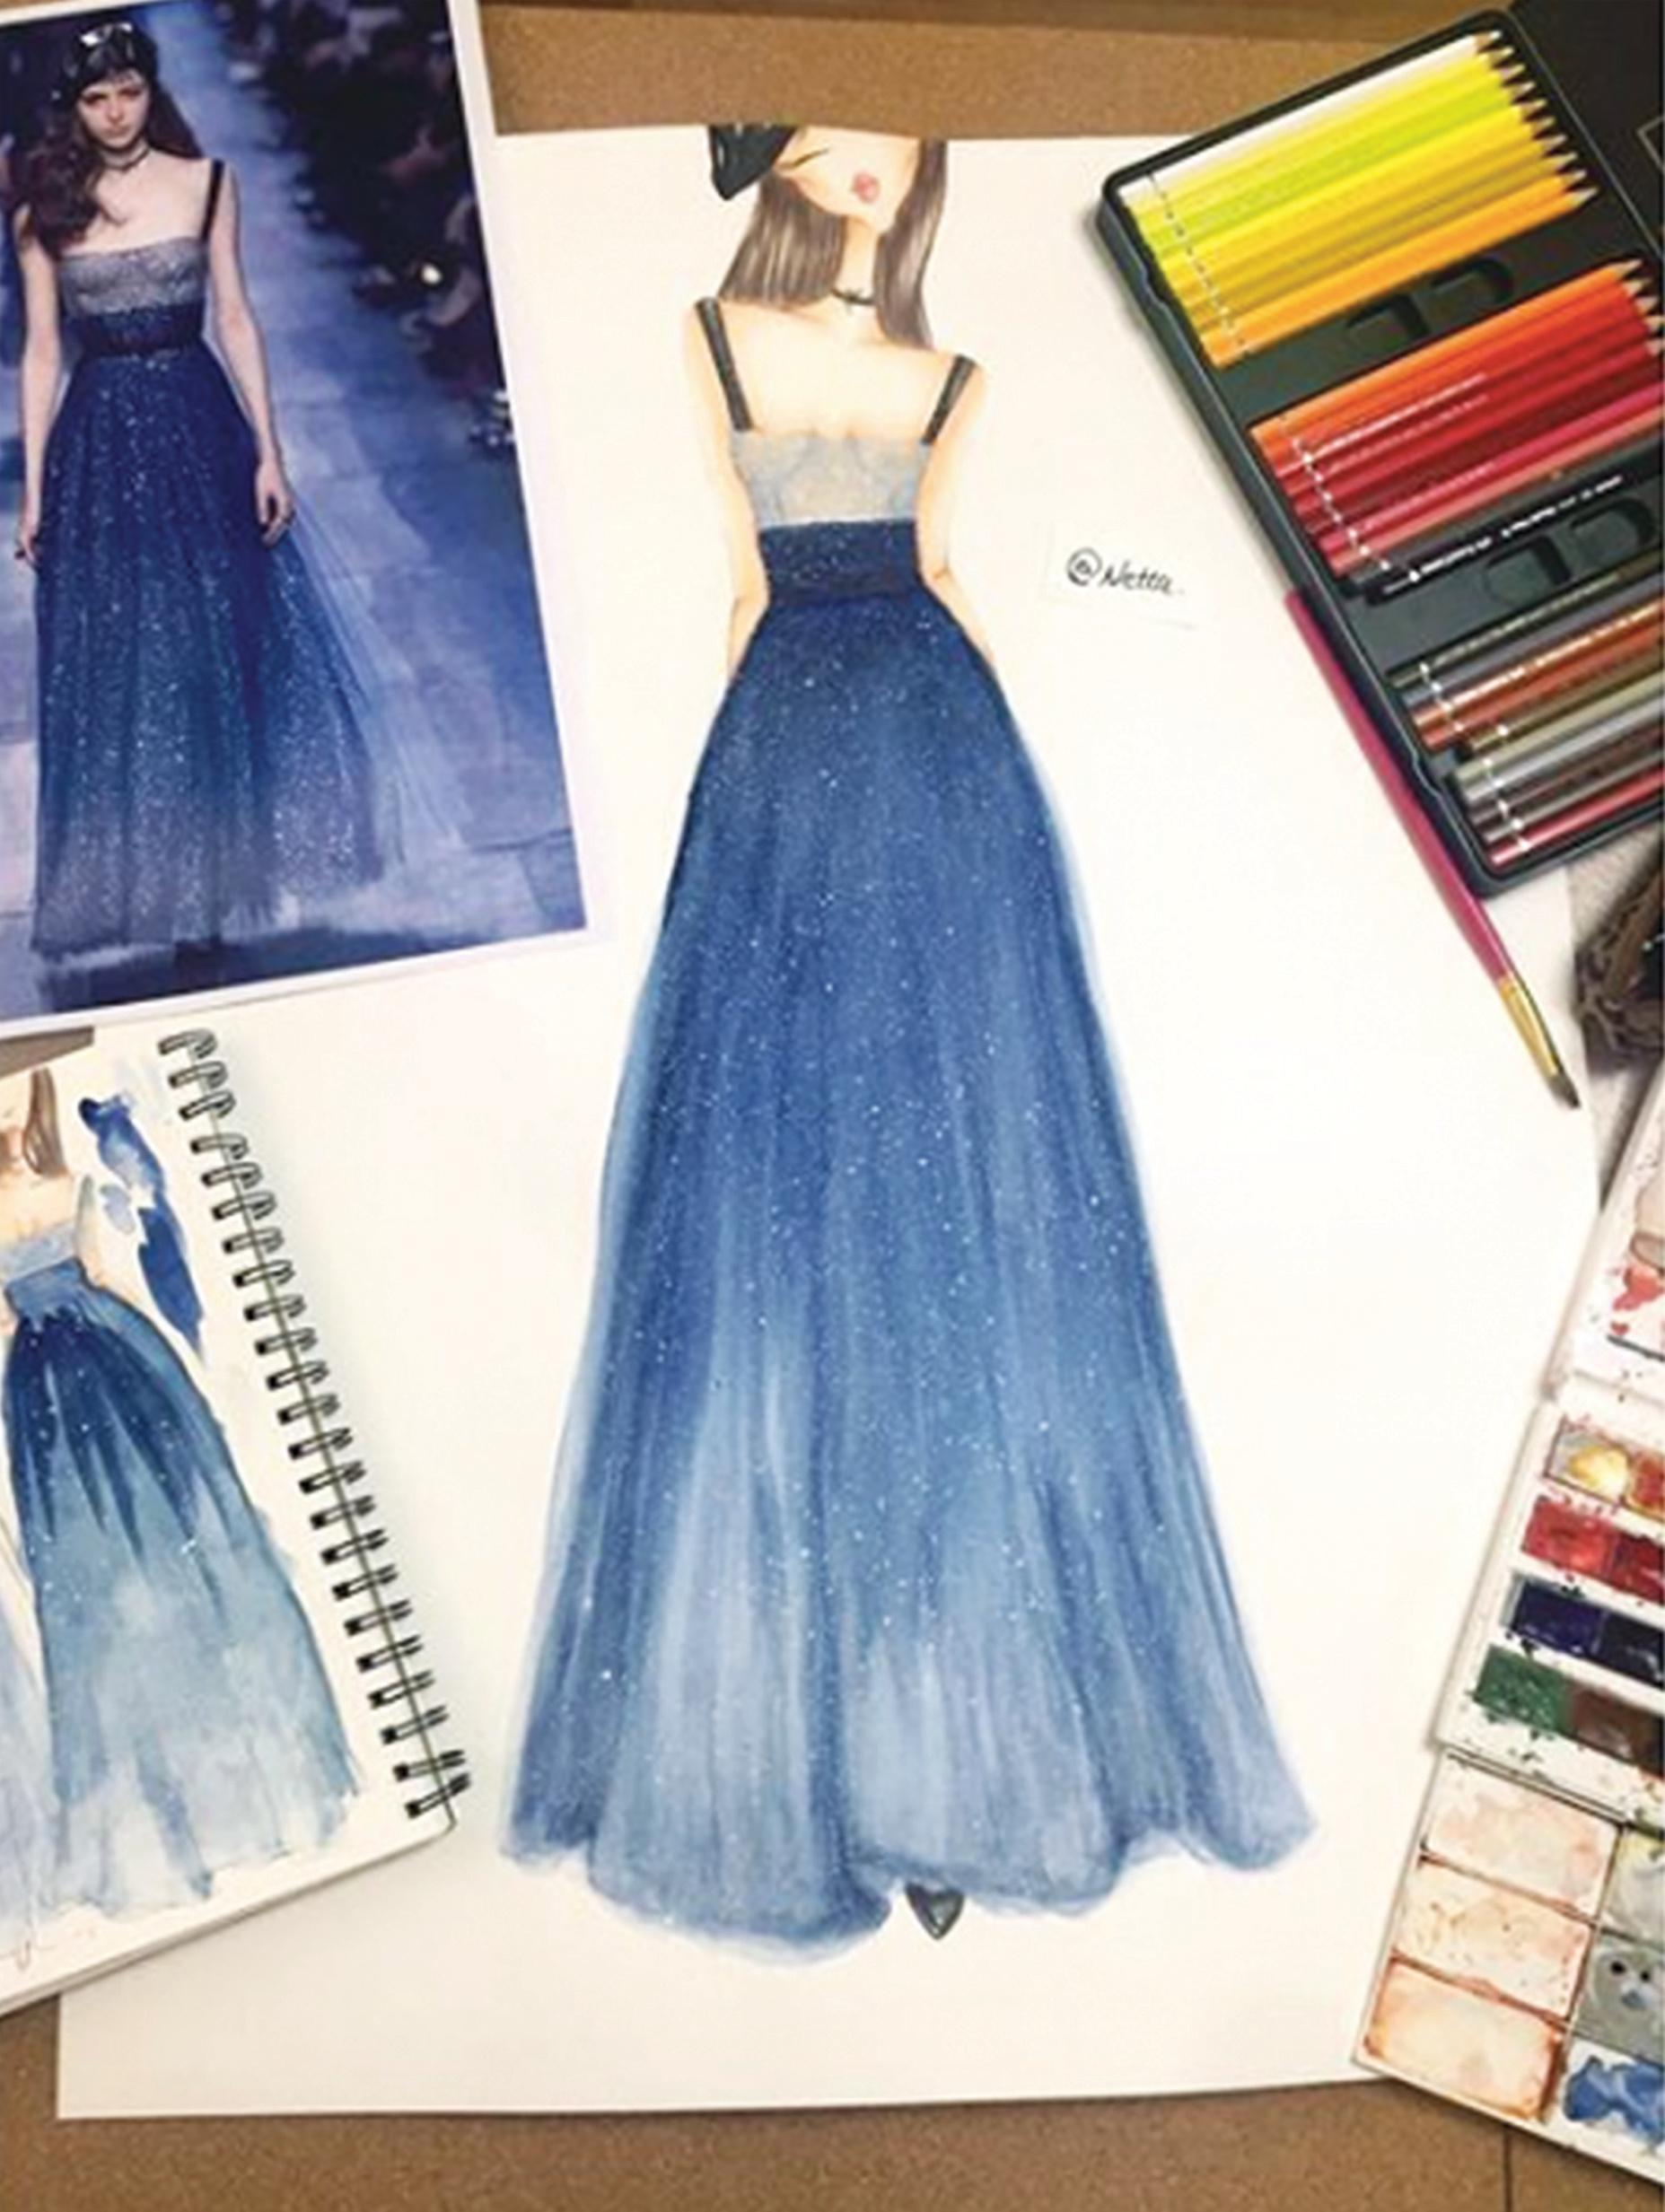 'Dior' Contest